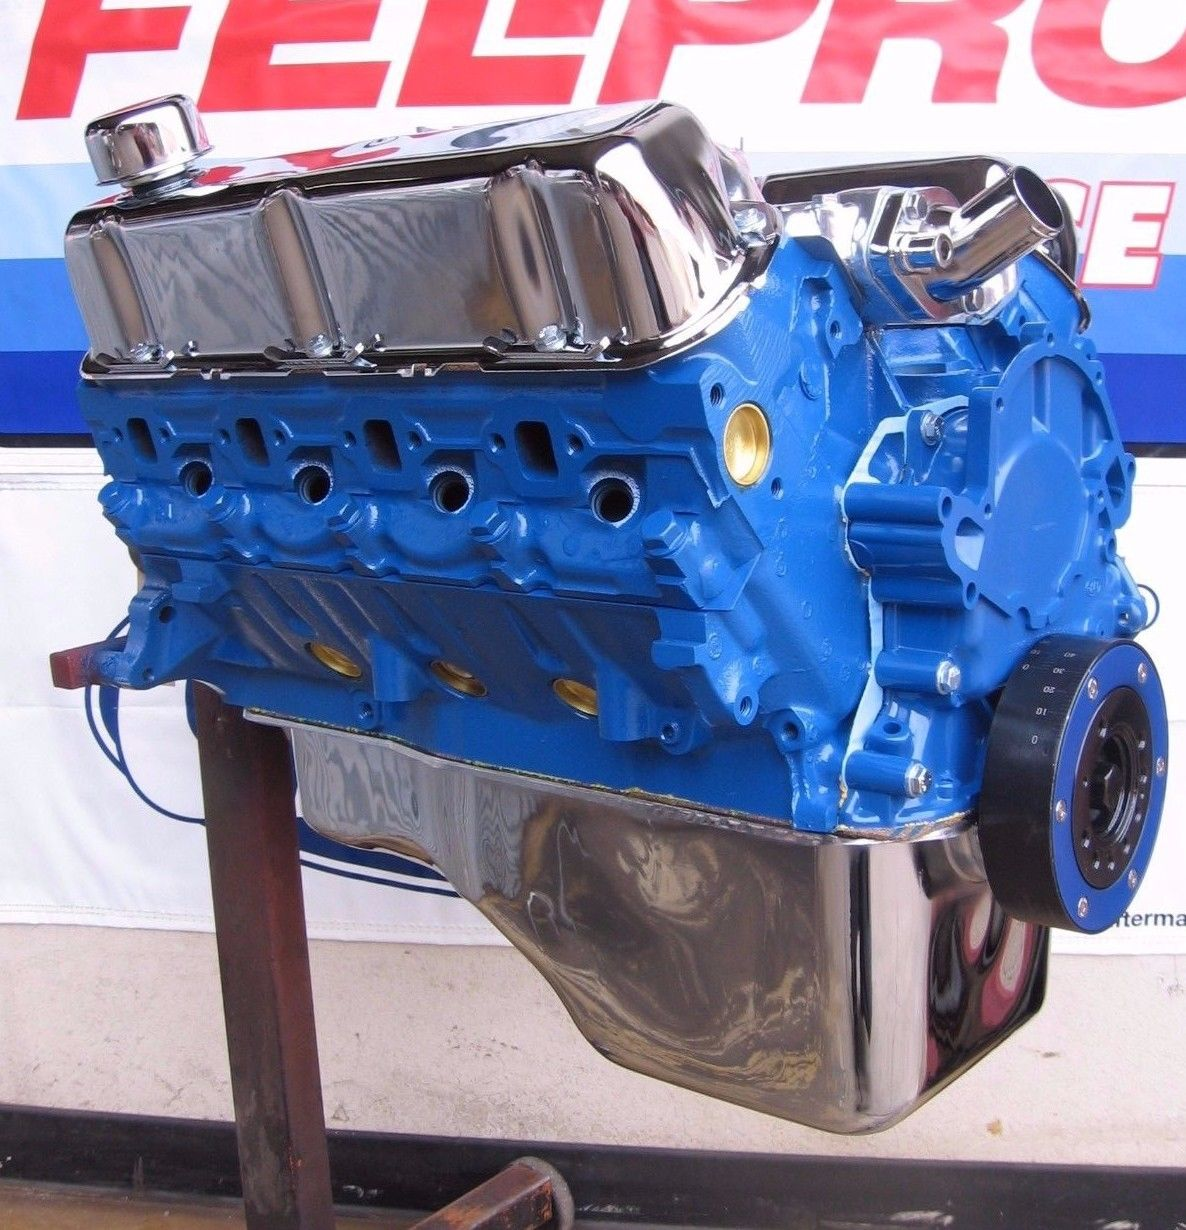 Ford 351 Windsor 345 HP High Performance Balanced Crate